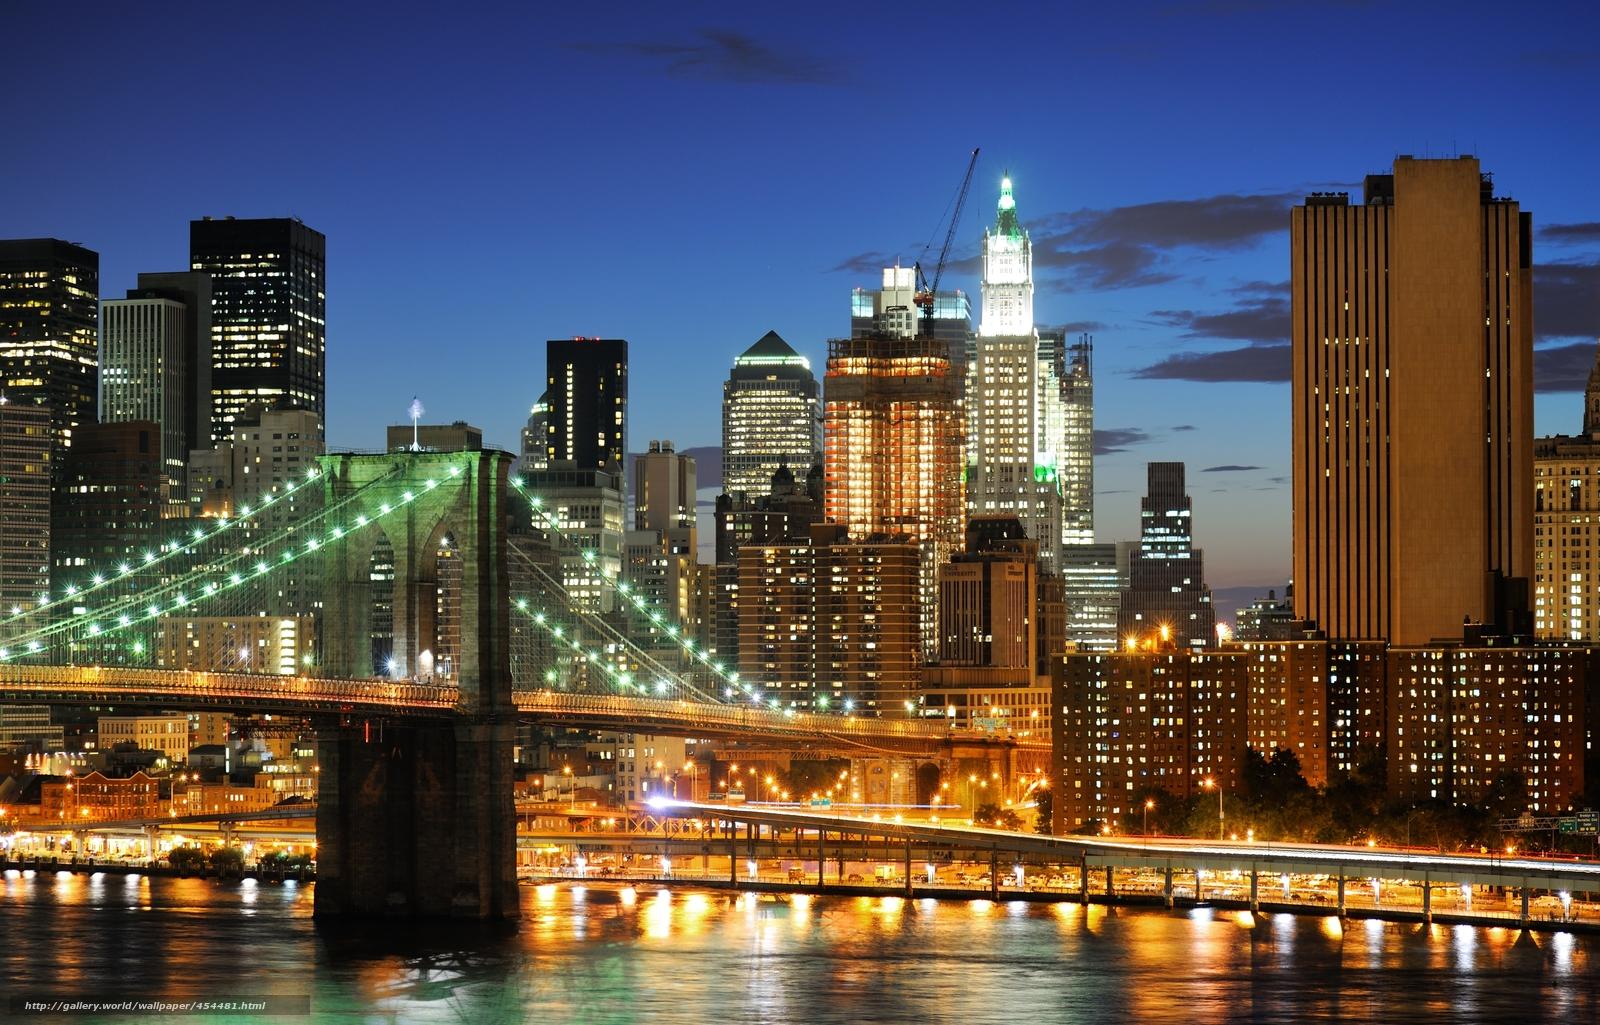 wallpaper new york city nyc USA New York desktop wallpaper 1600x1025